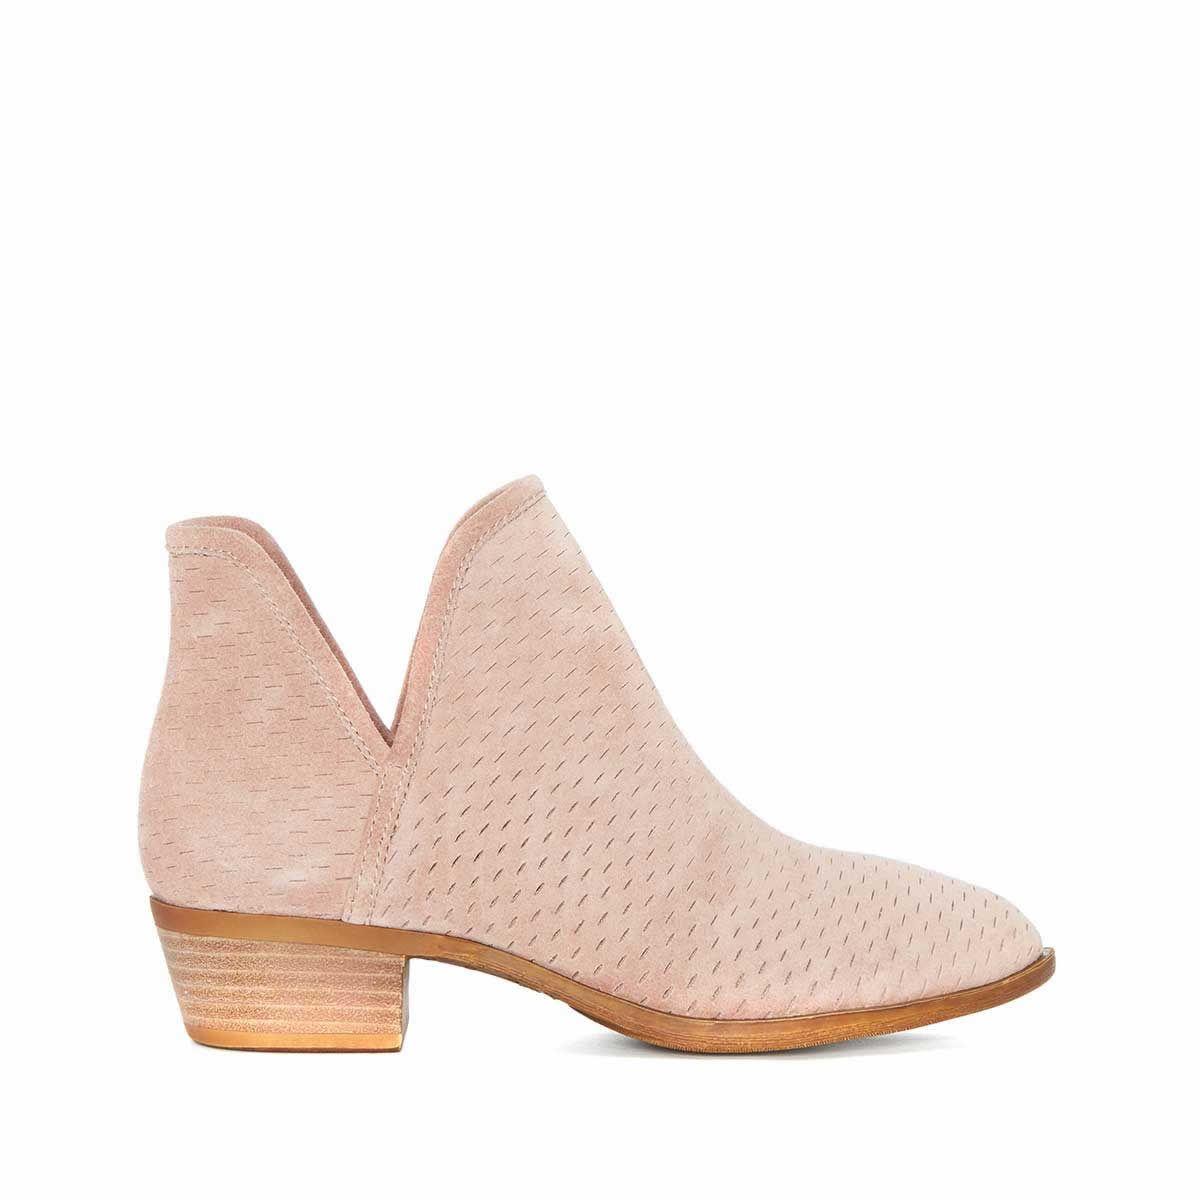 e0d58db643e6b Lucky Brand Shoes - Macy s